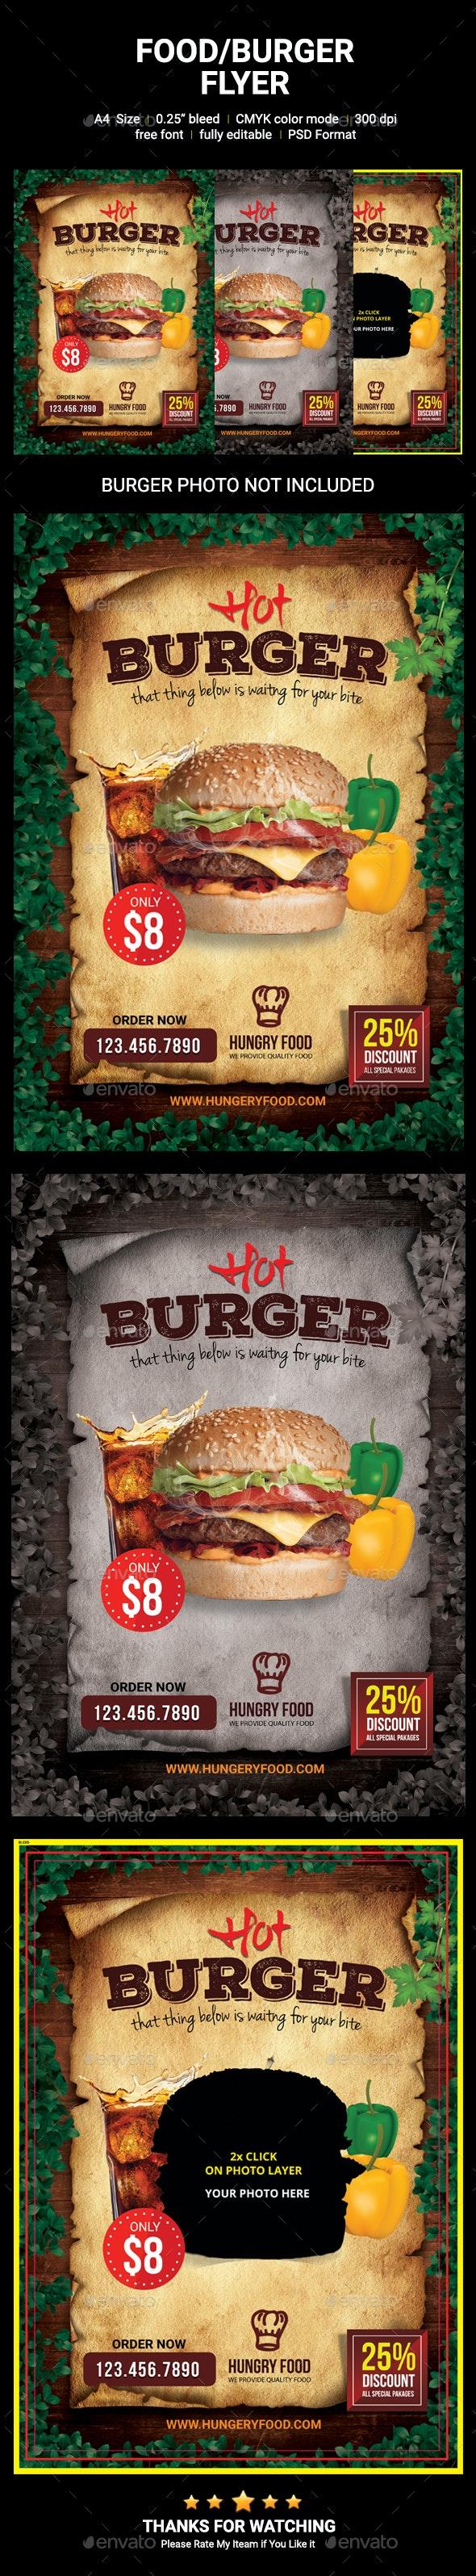 Food/Burger Flyer - Restaurant Flyers